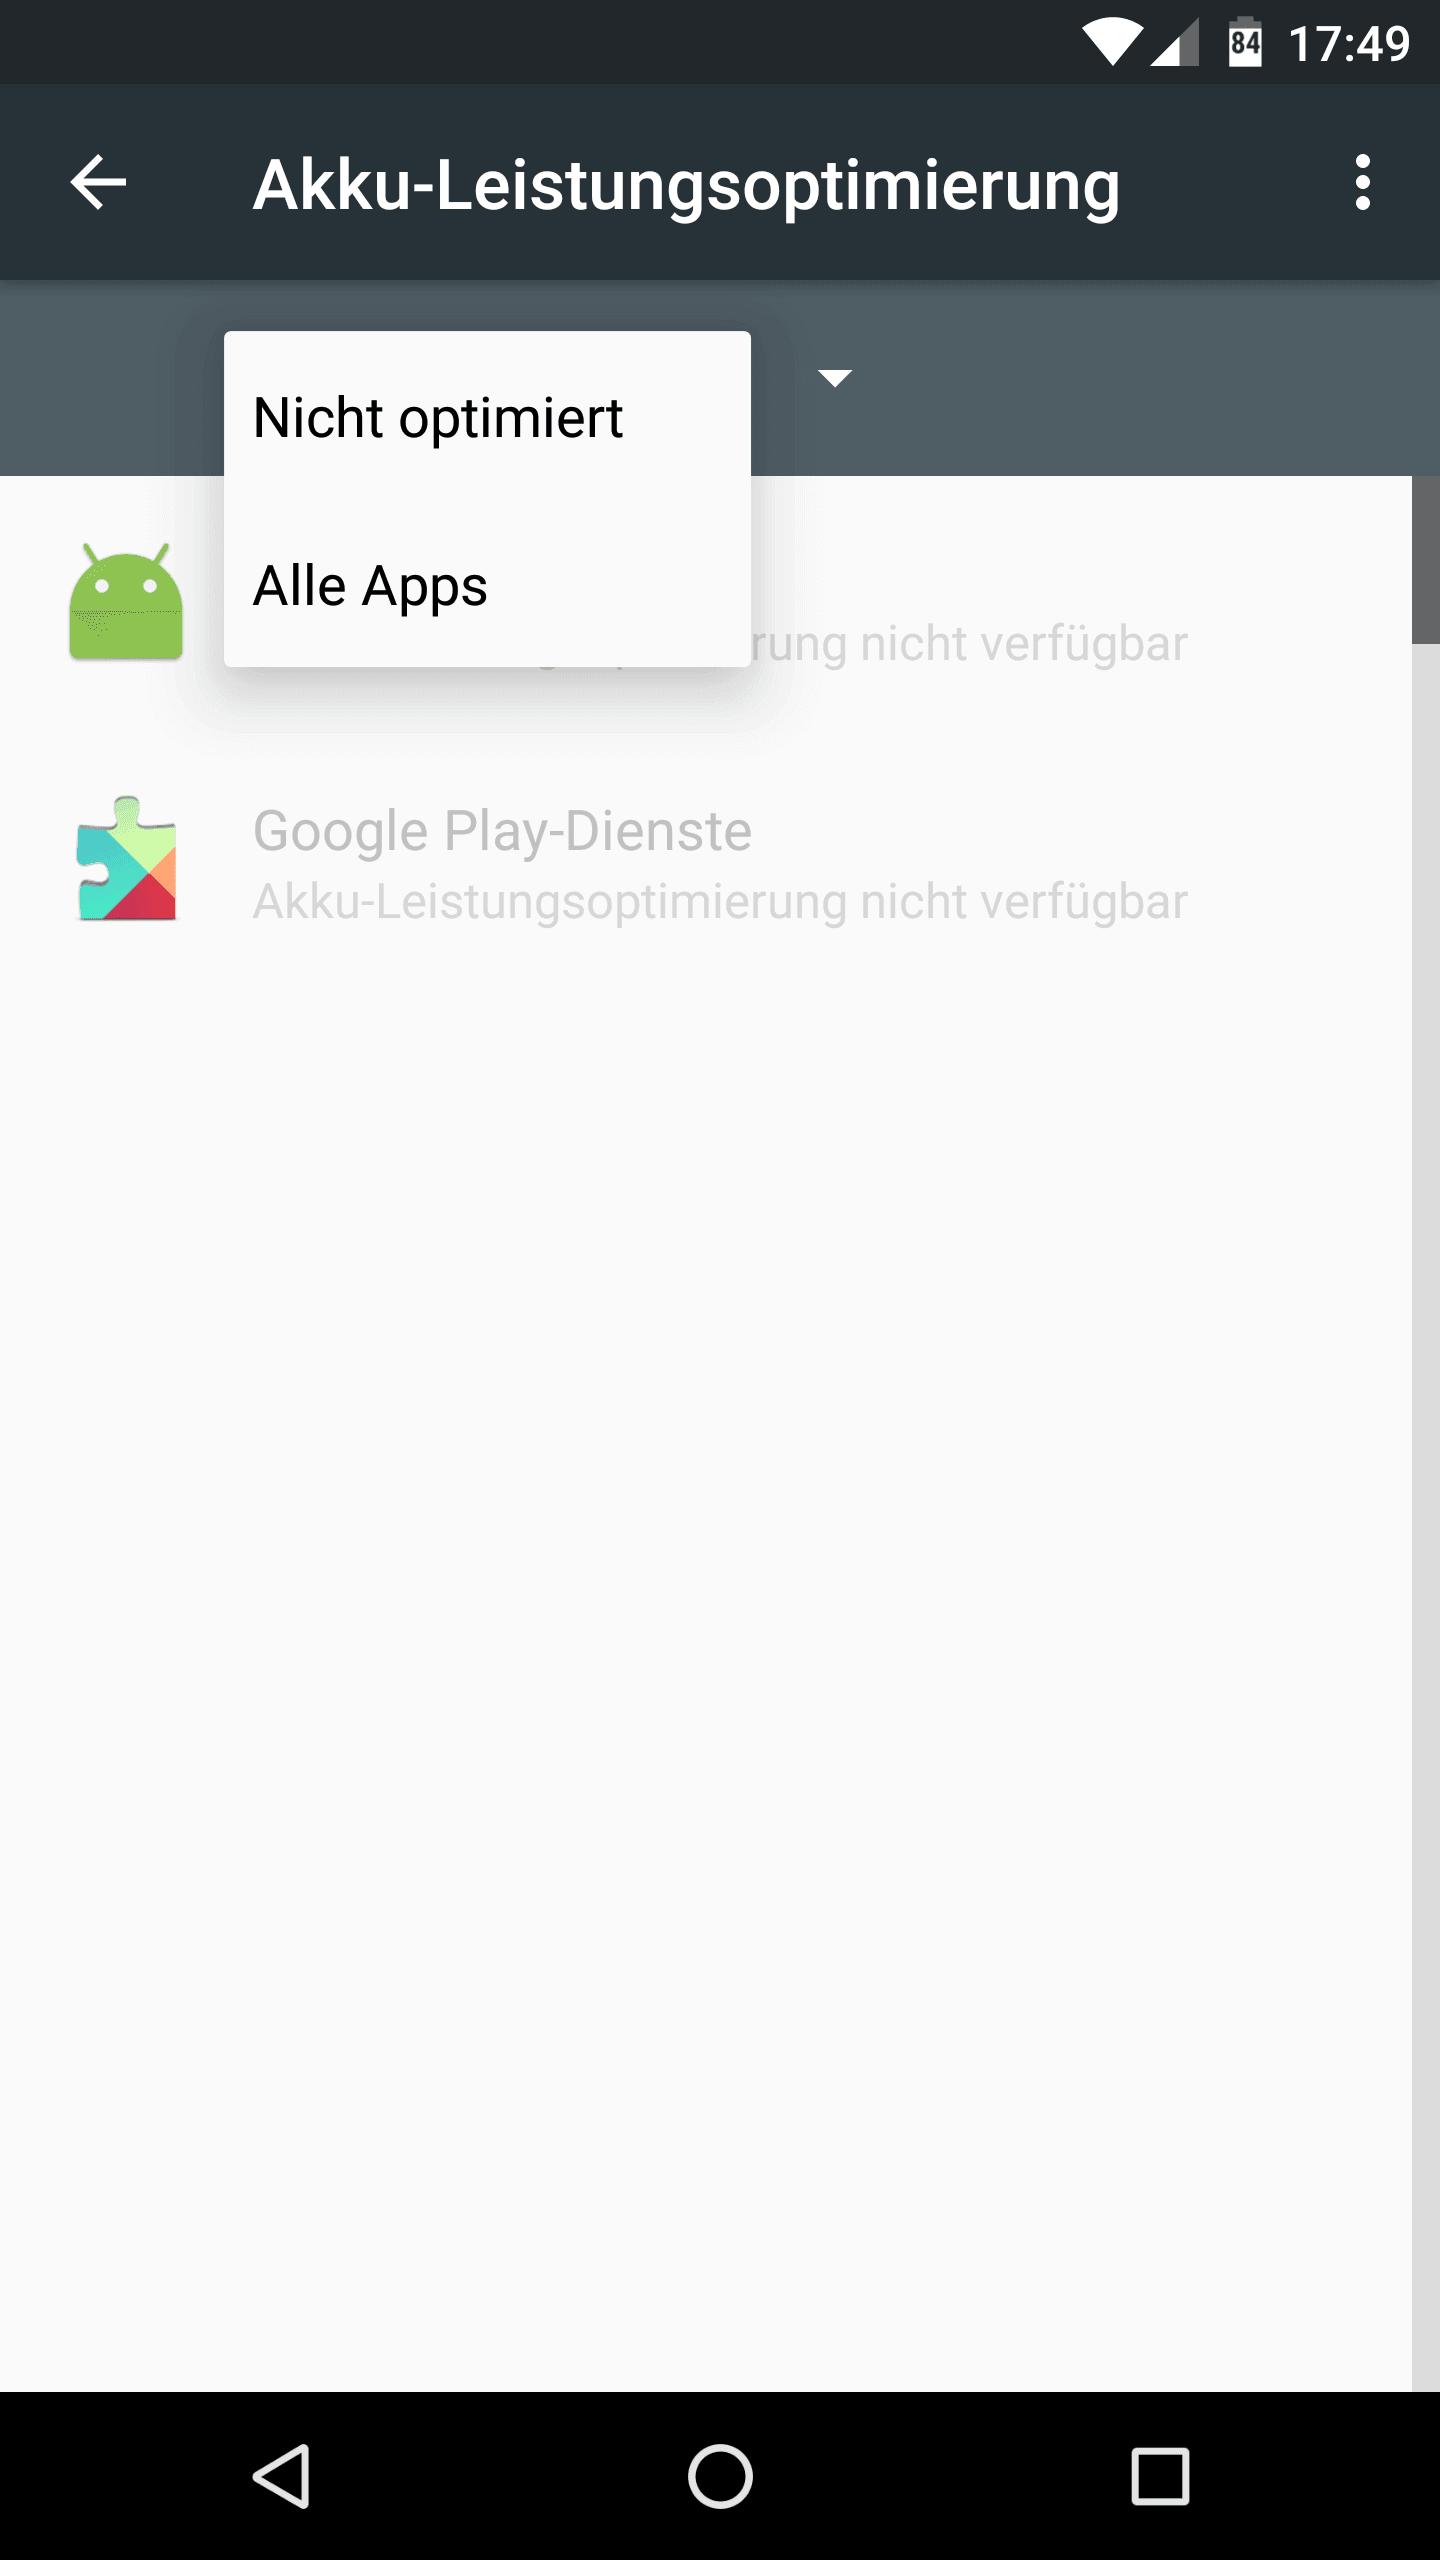 Anleitung: Doze deaktivieren unter Android Nougat & Marshmallow 8 techboys.de • smarte News, auf den Punkt! Anleitung: Doze deaktivieren unter Android Nougat & Marshmallow